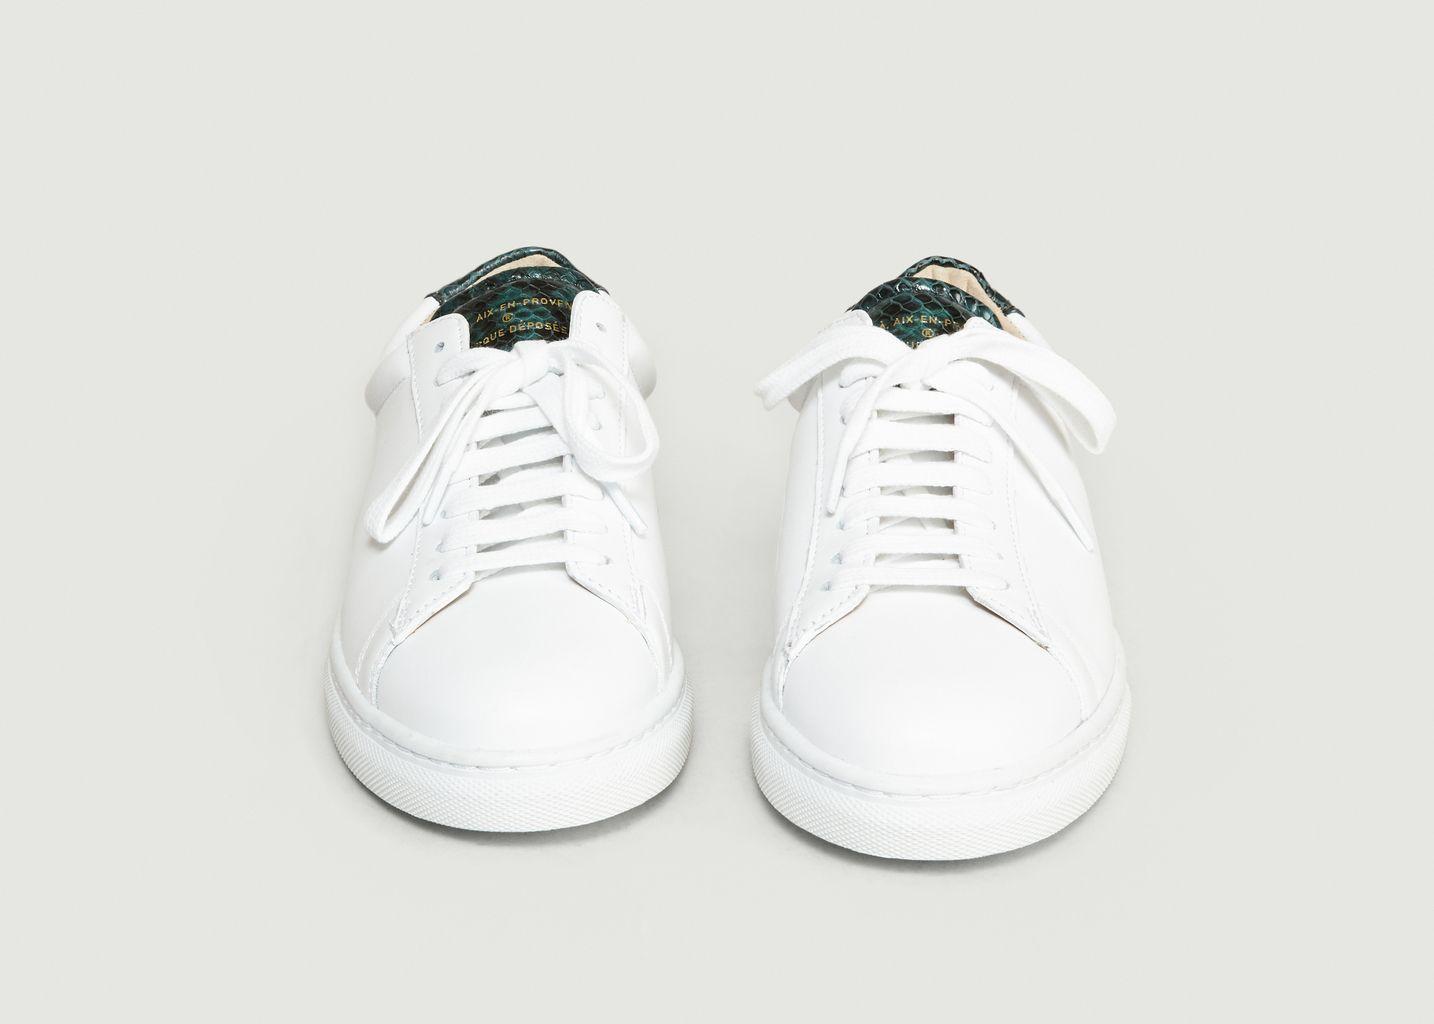 Sneakers ZSP4 En Cuir Nappa Apla Vipère - Zespa